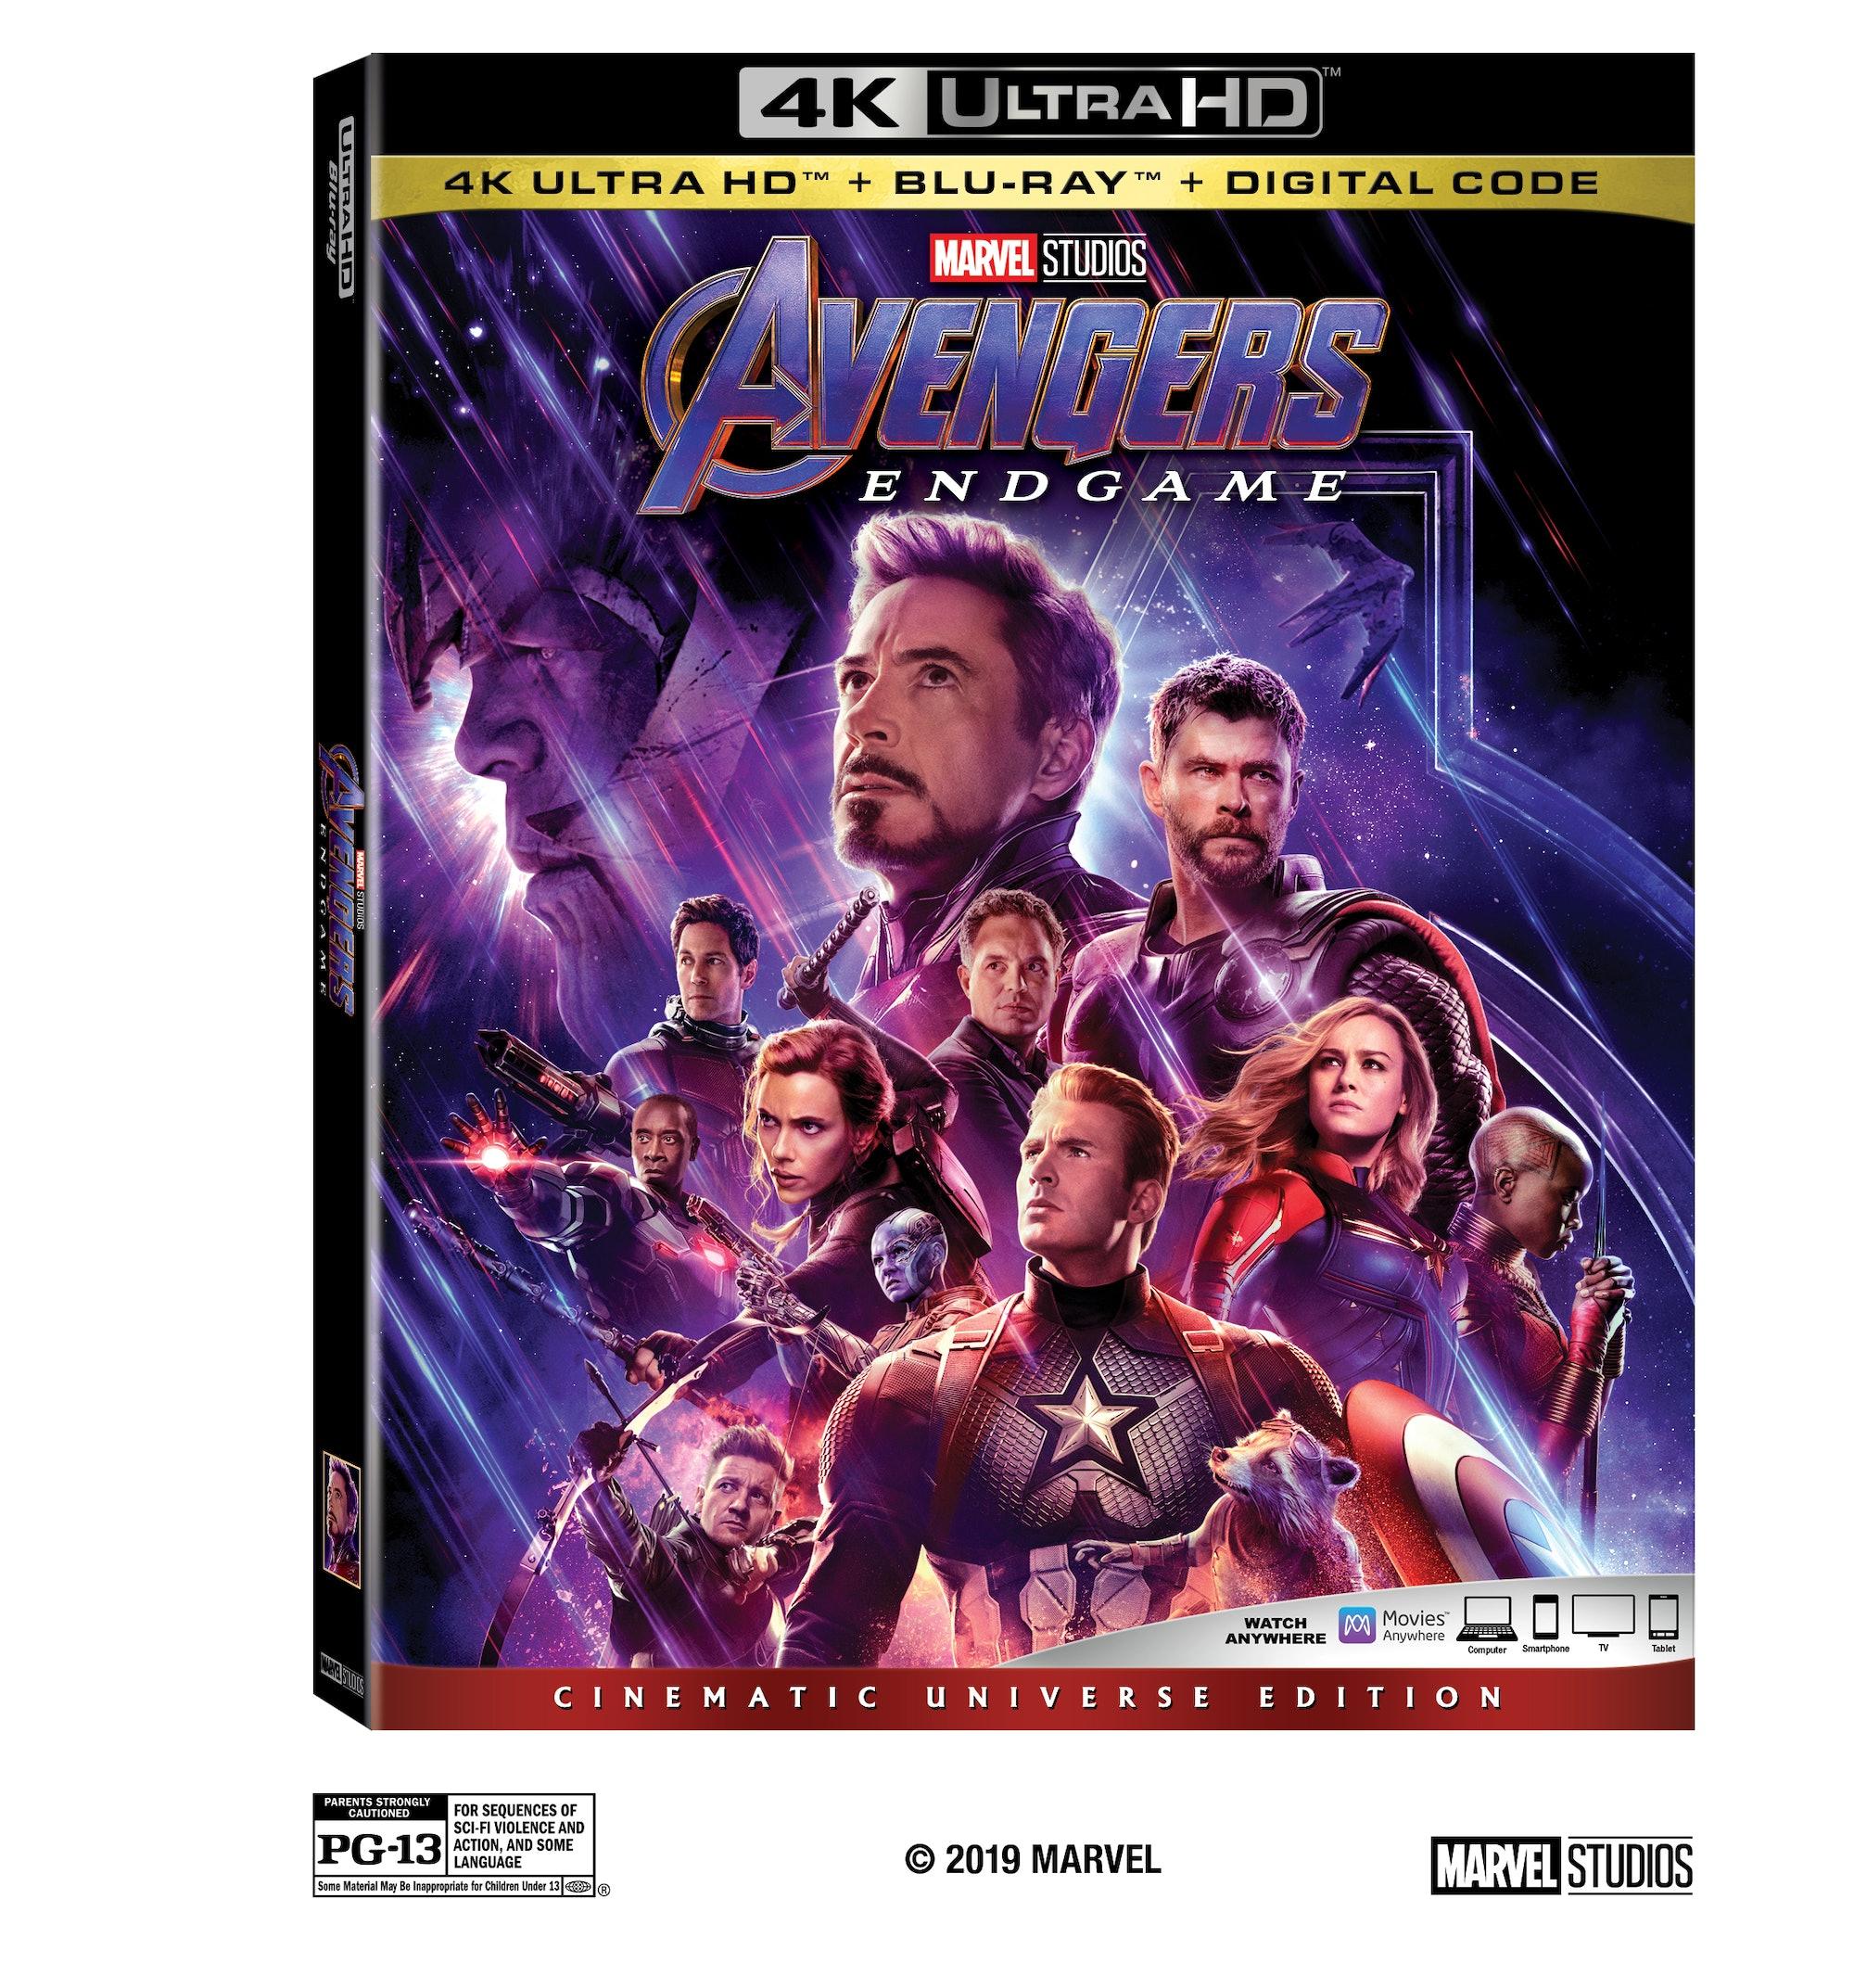 Avengers Endgame Blu-ray Release Date